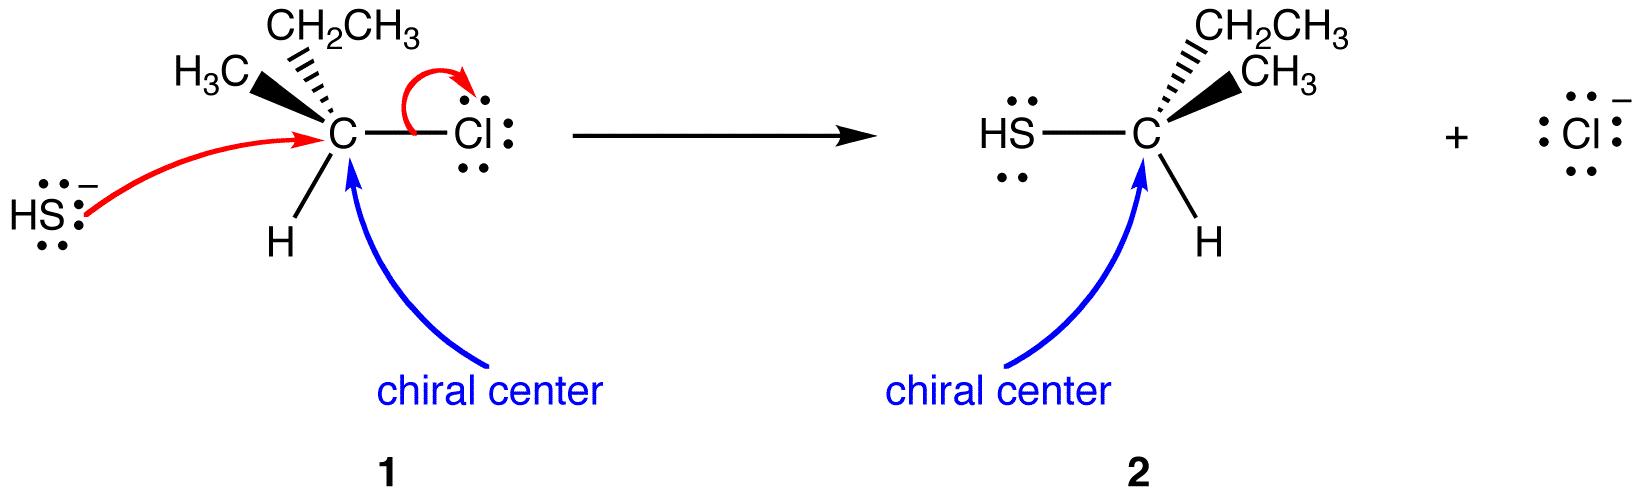 Inversion Of Configuration Ochempal